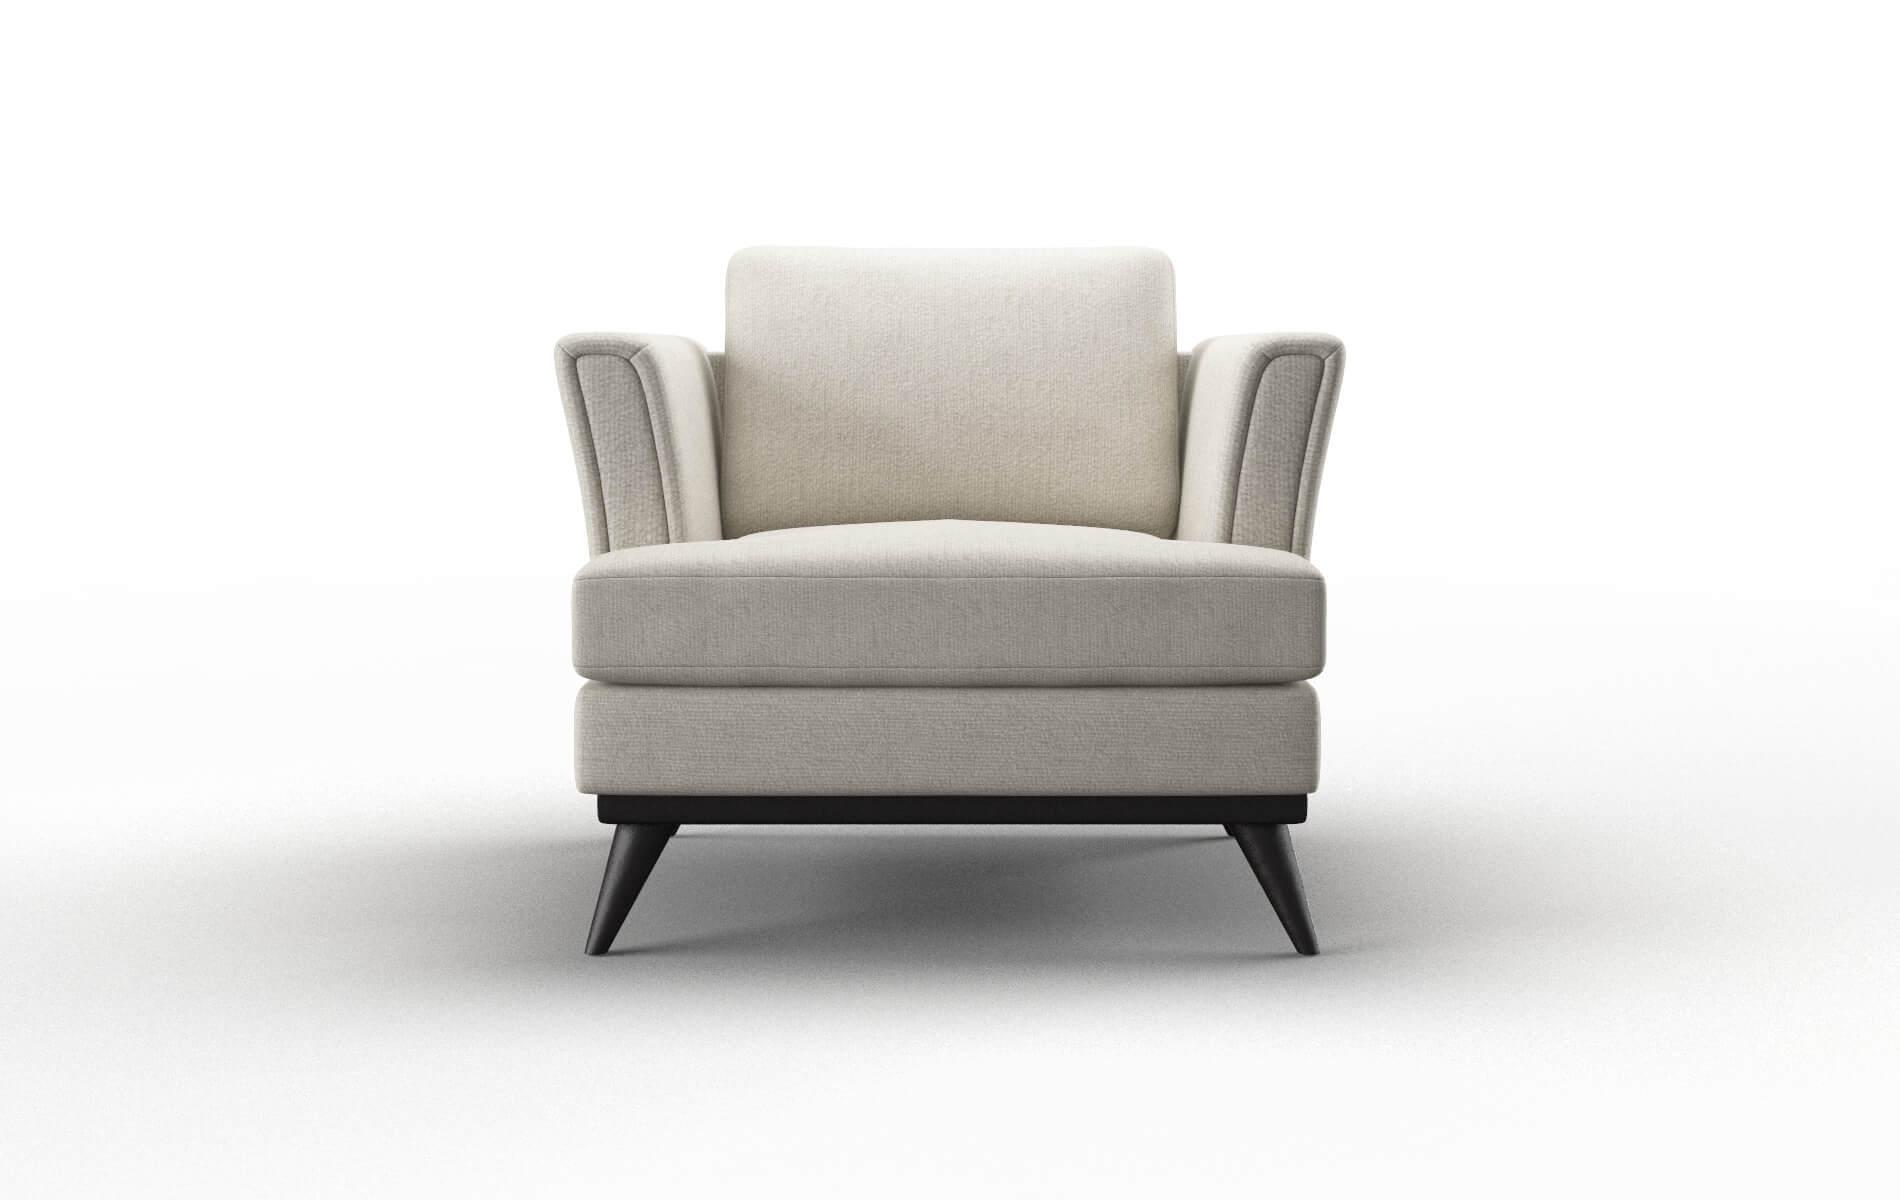 Antalya Sasha Linen chair espresso legs